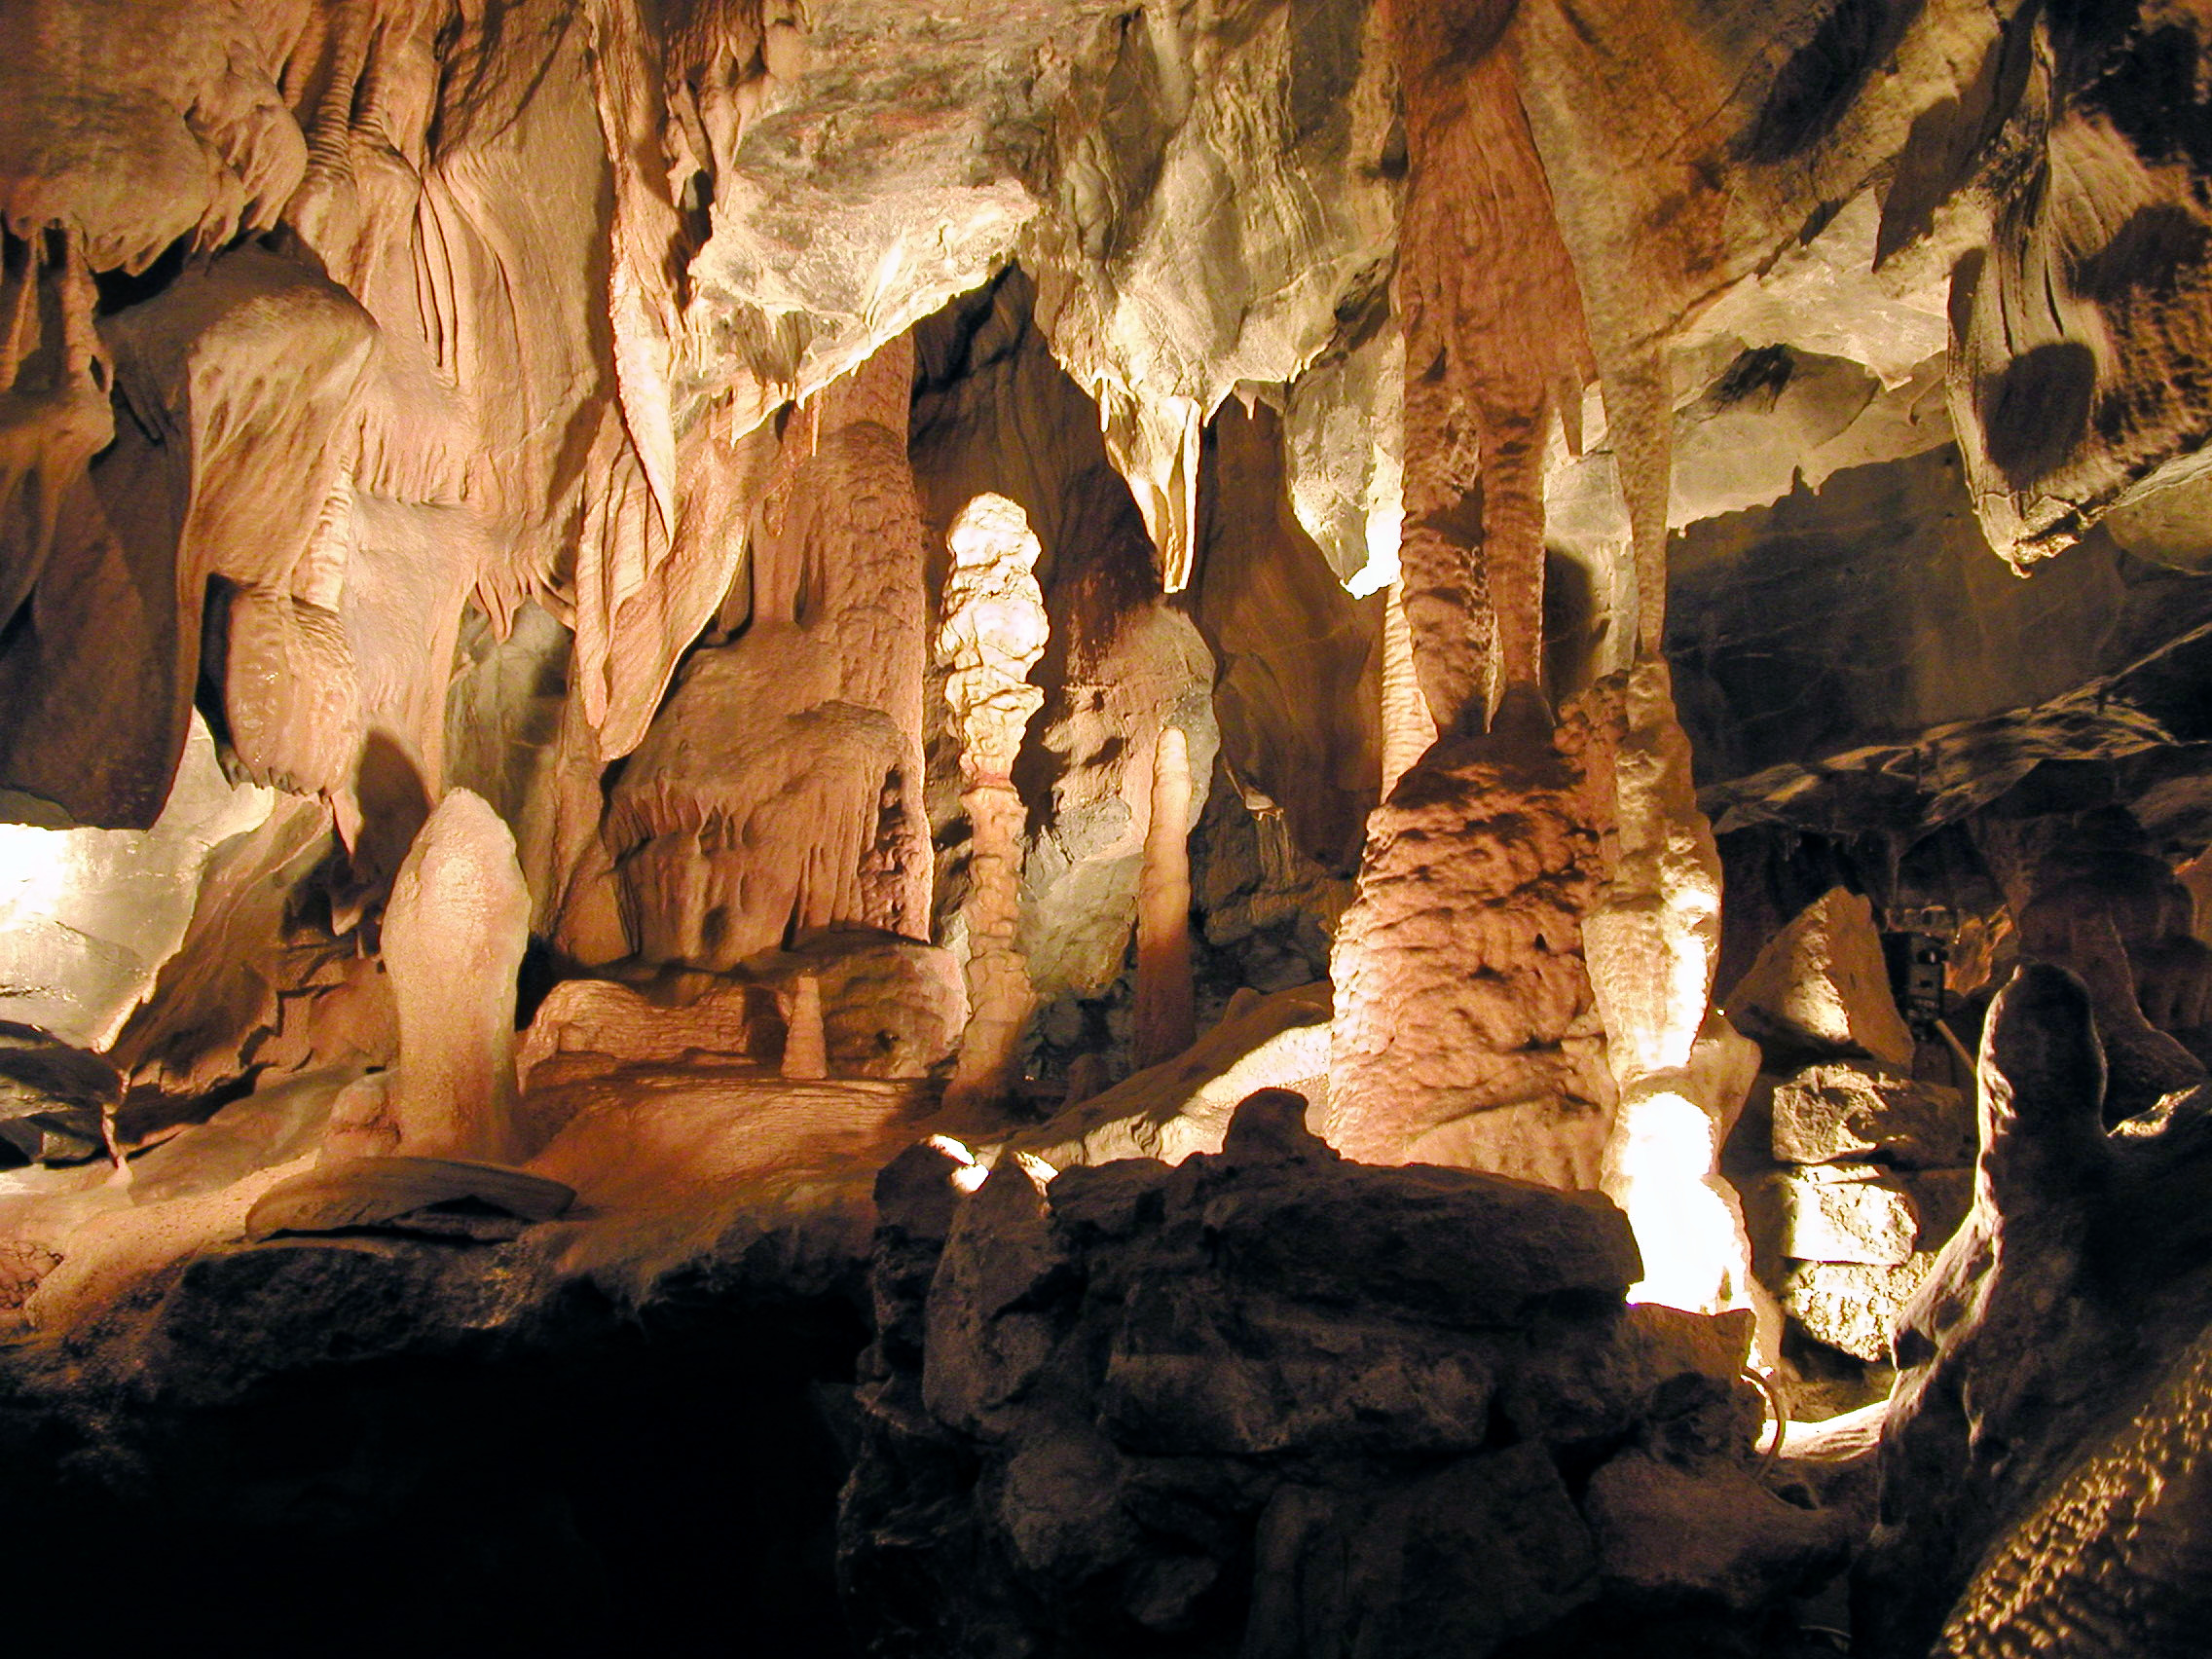 1532006809_meghalaya-tours-limestone-caves.jpg